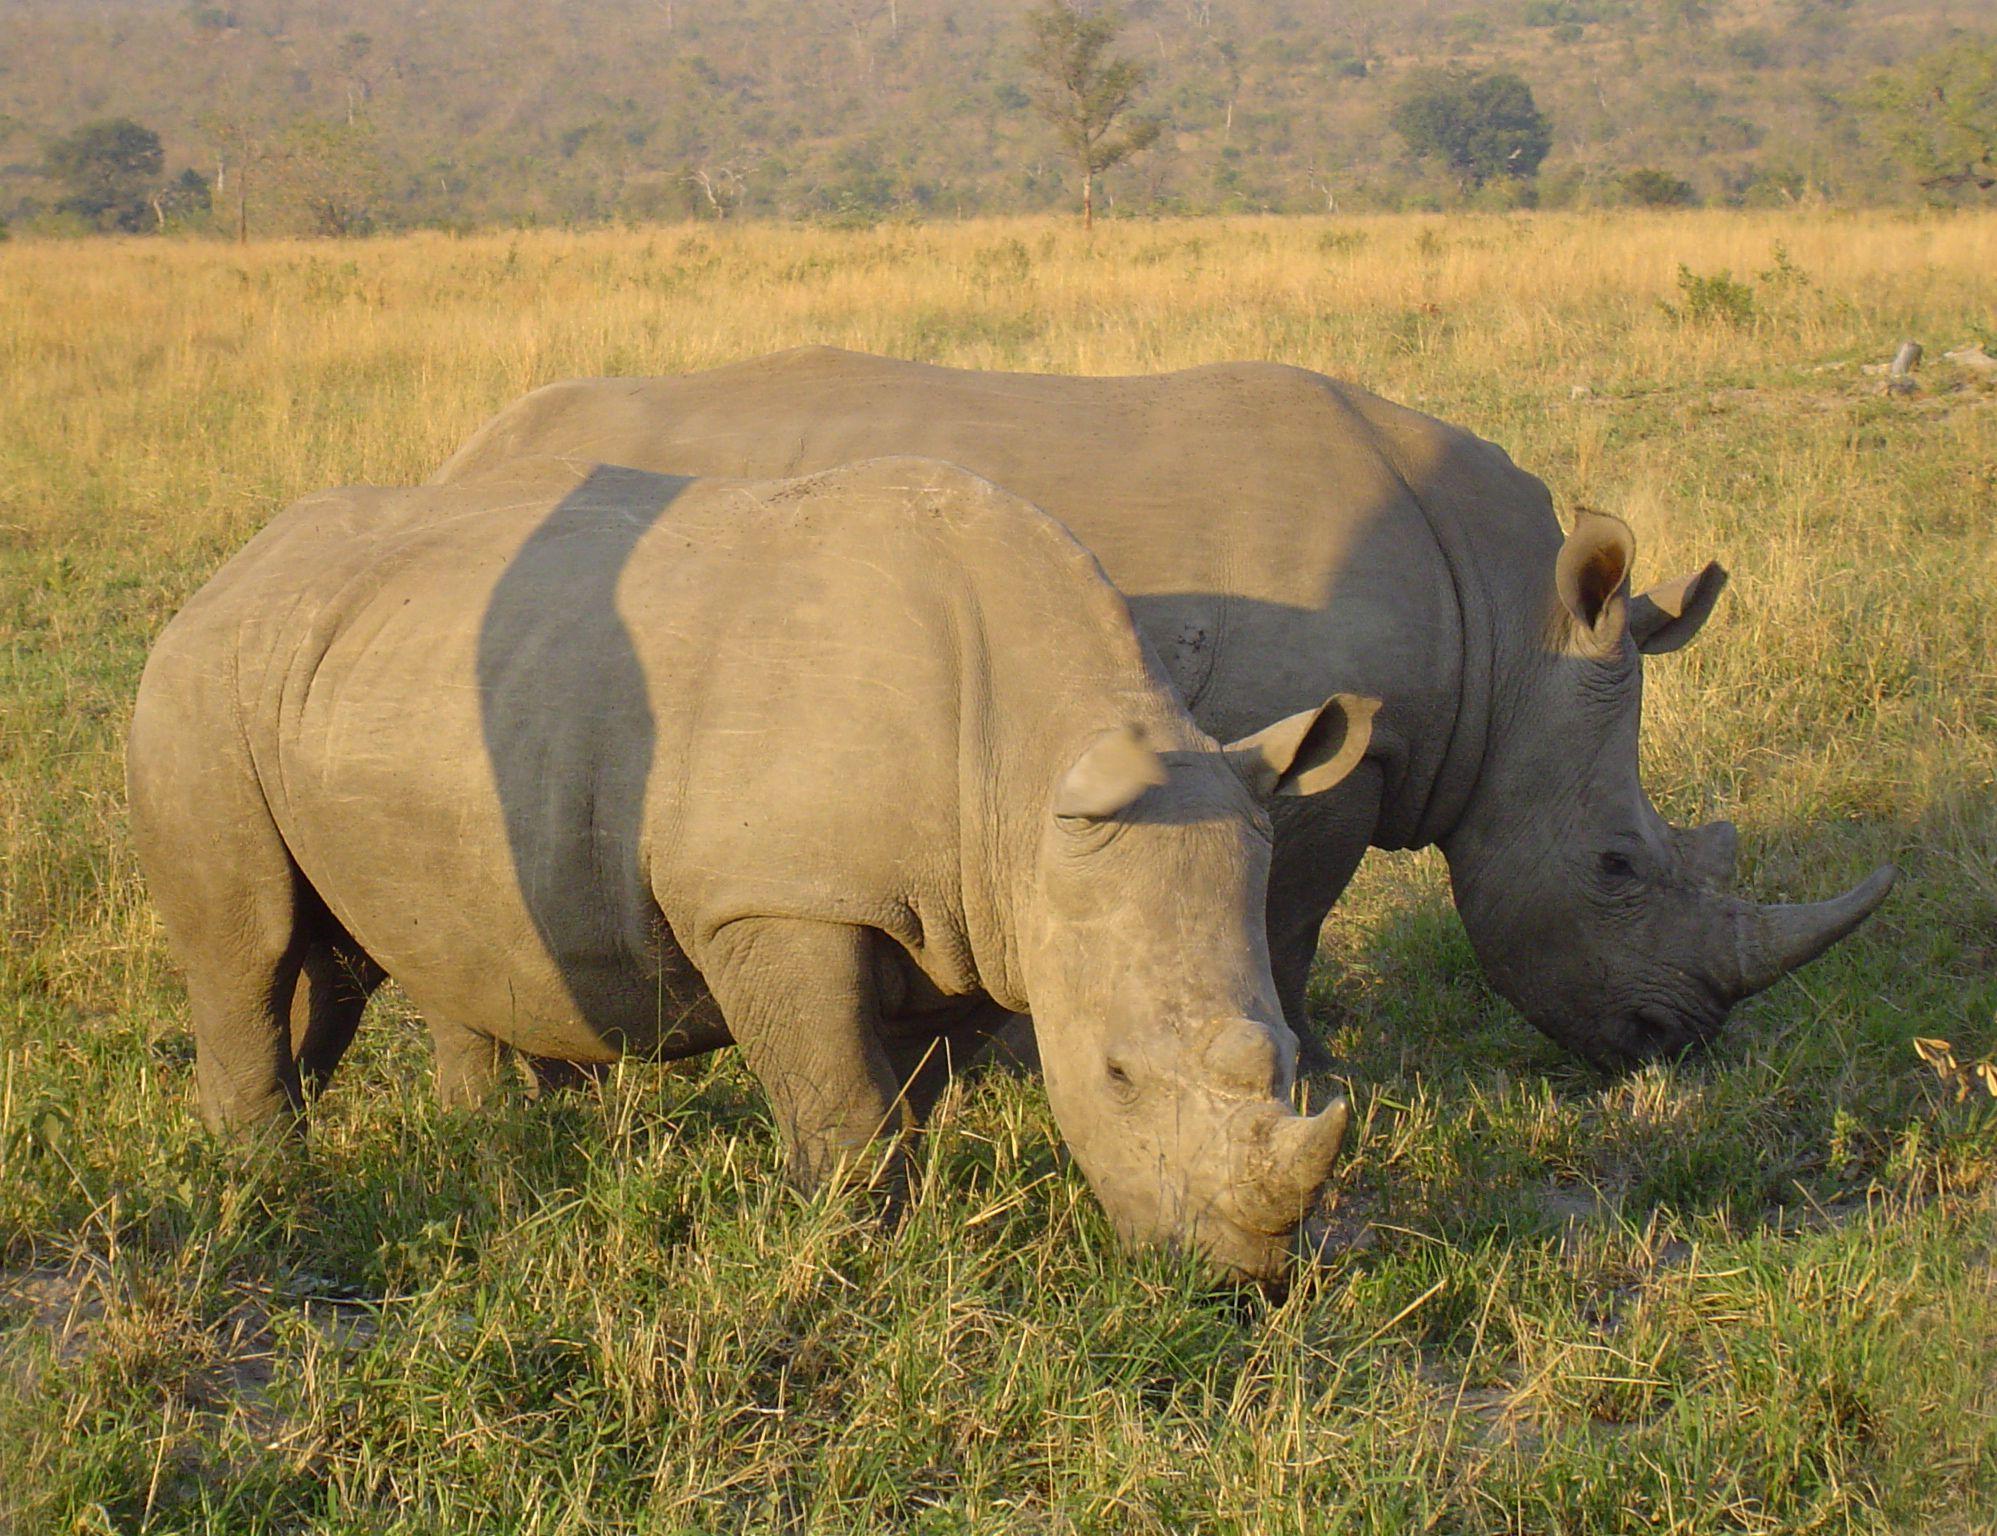 2005070719452421Rhinoceros in South Africa